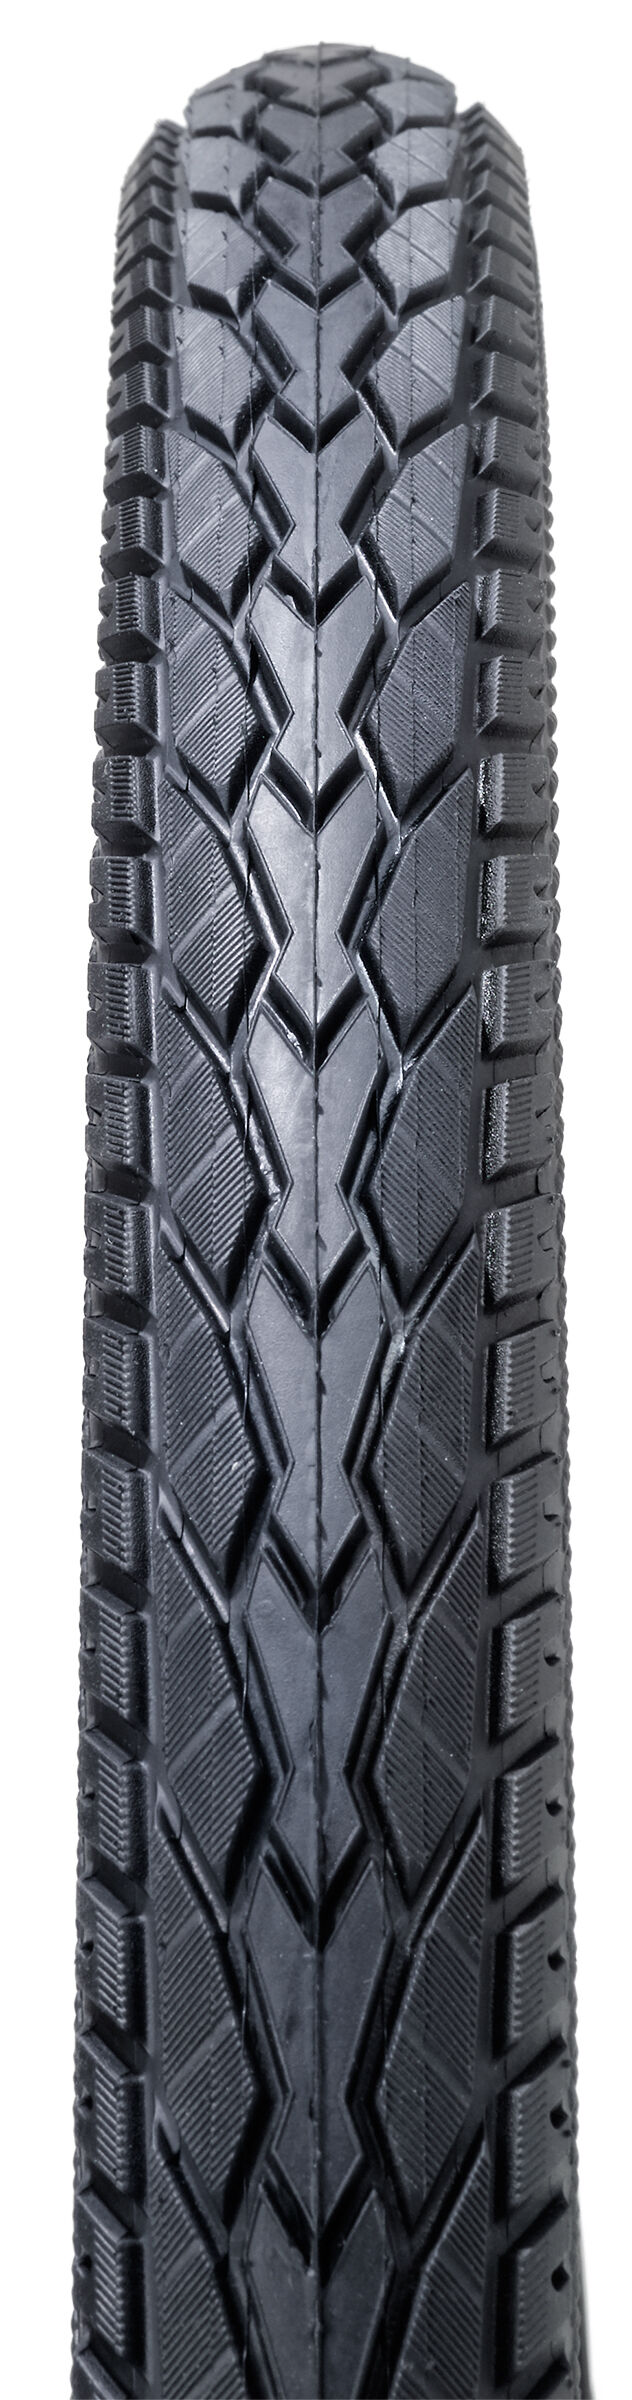 "Hybrid Comfort Bike Tire 26"" x 1.95"""